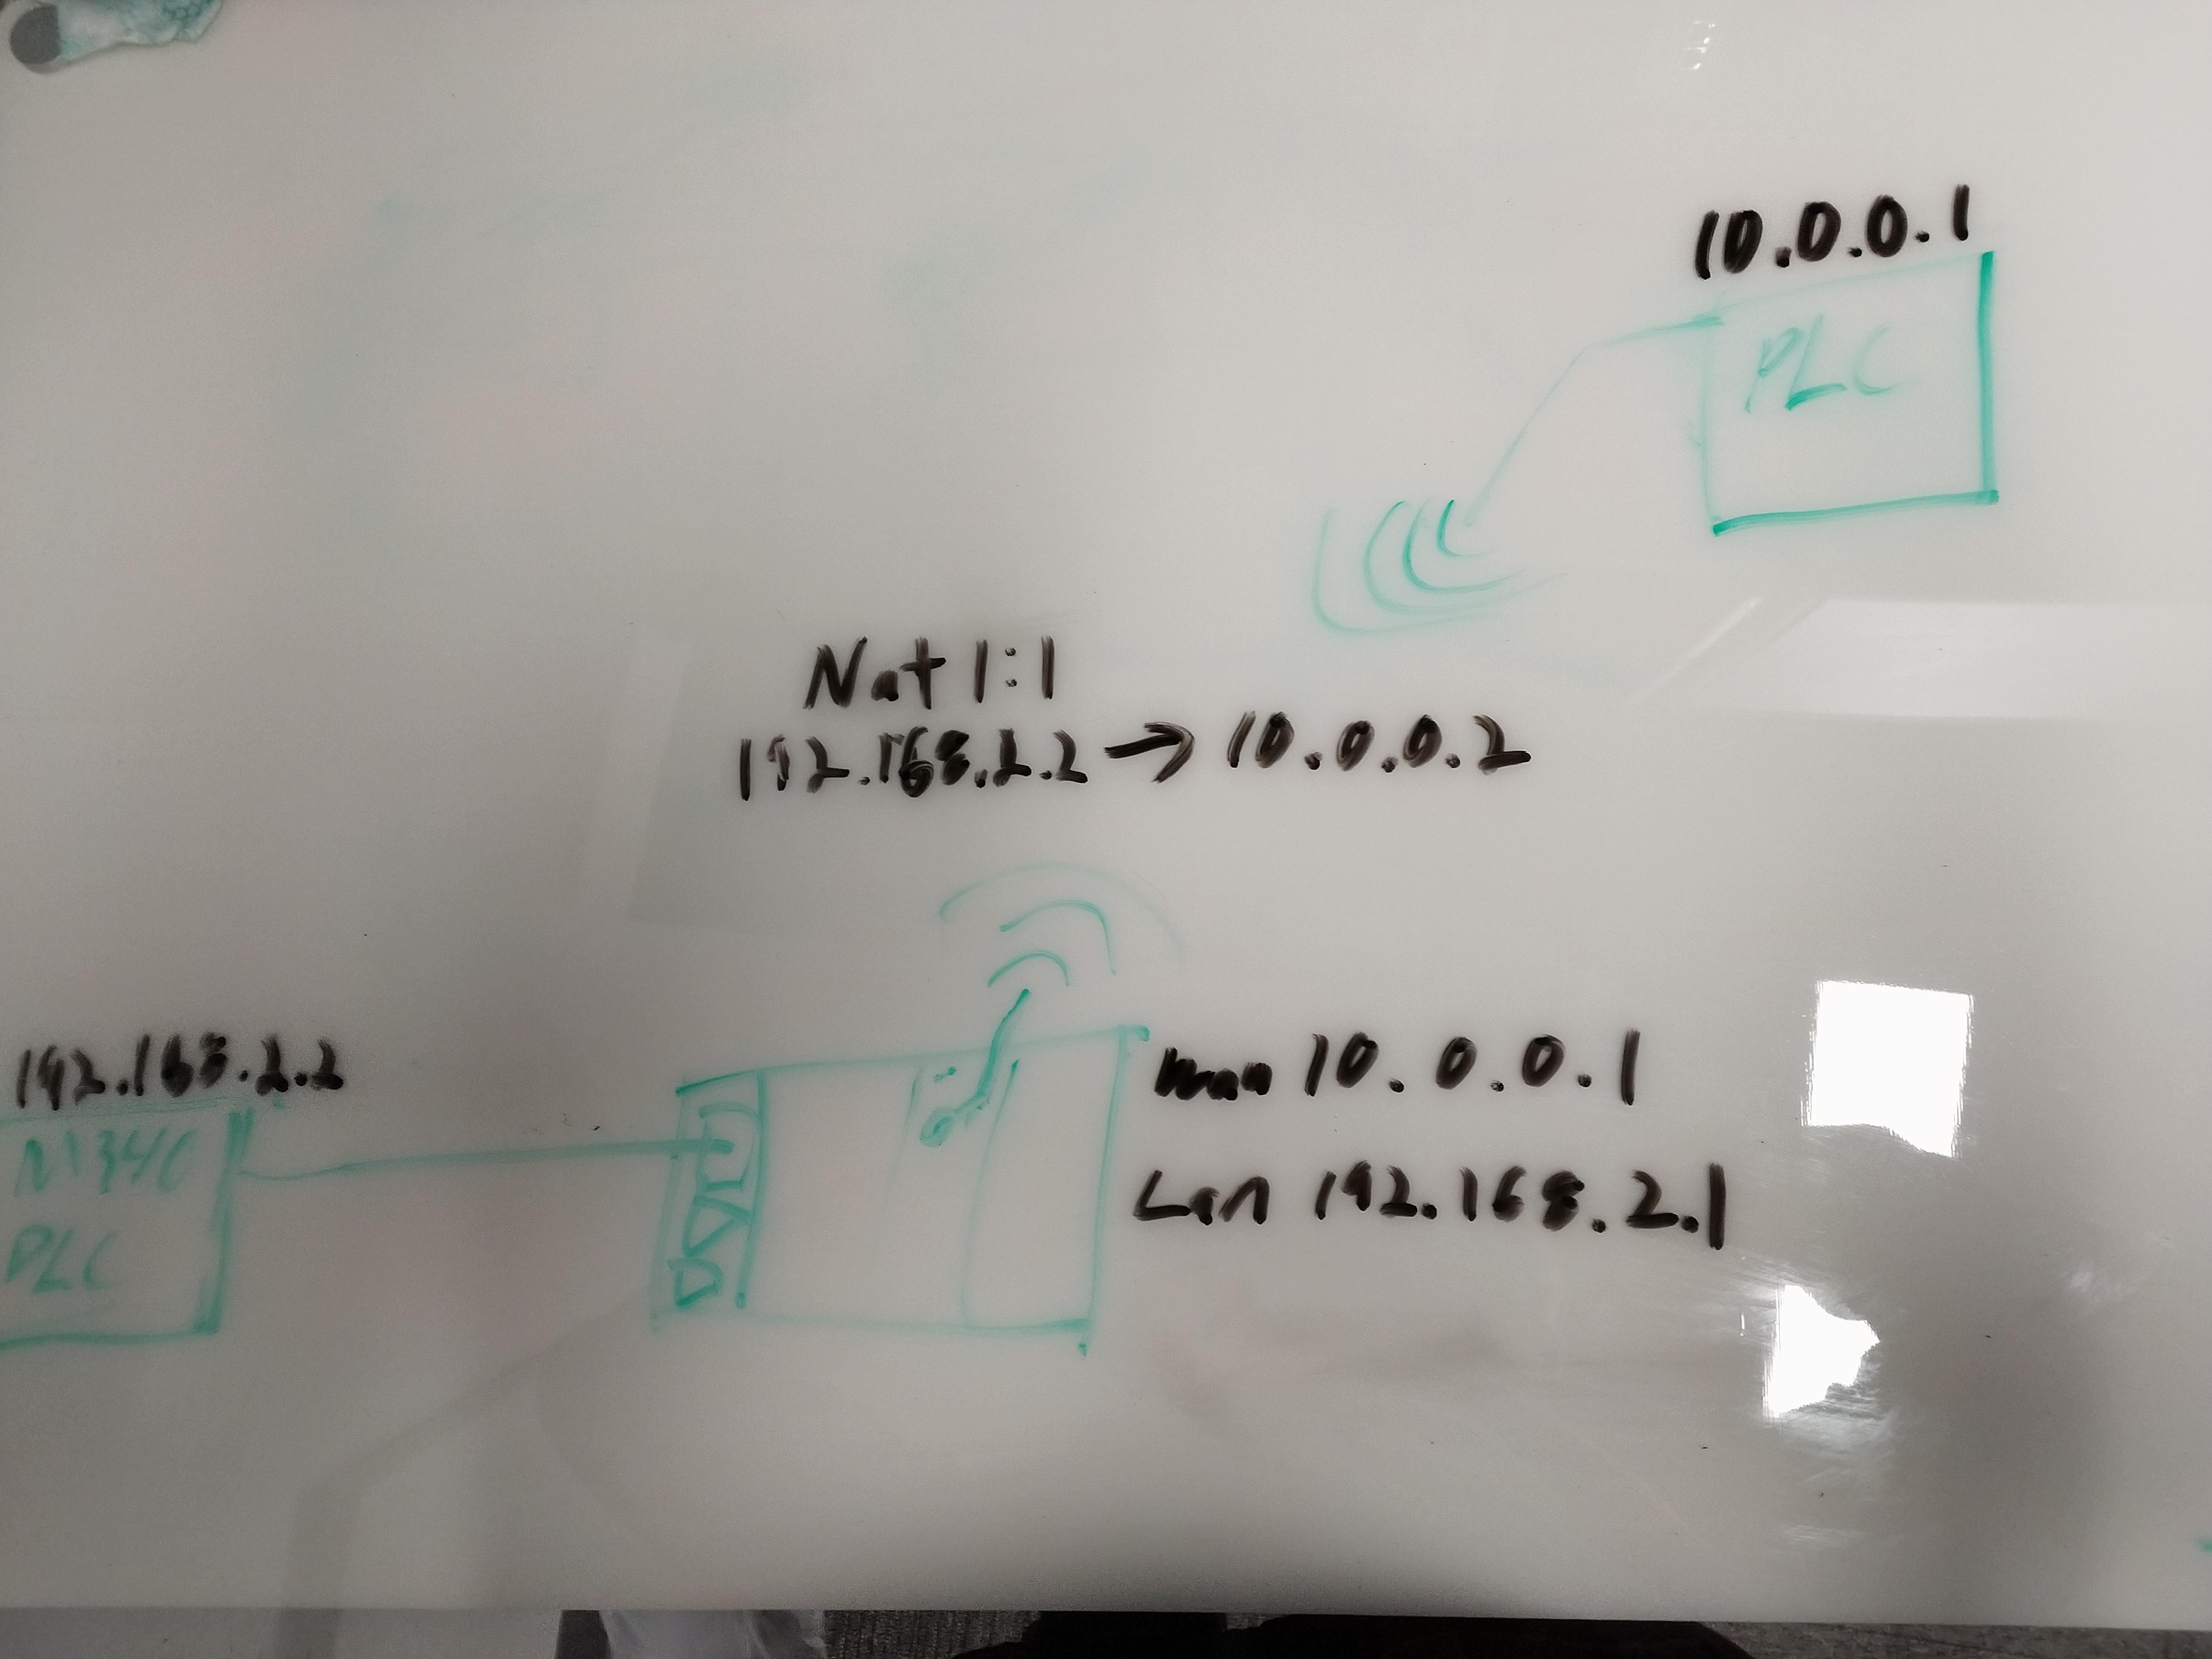 Flexy as a gateway between 2 plcs    through wifi - eWON